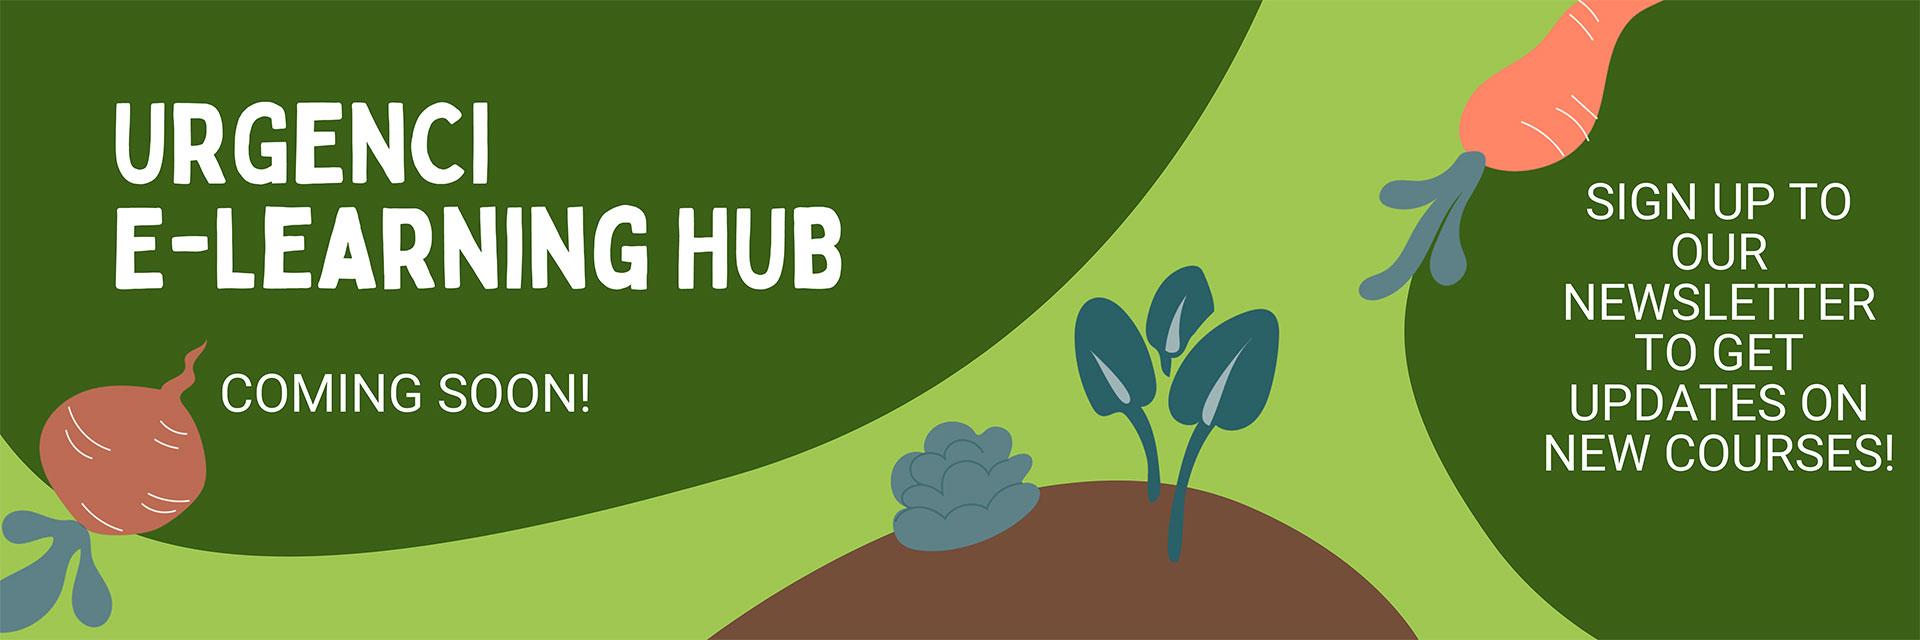 Urgenci Hub Banner